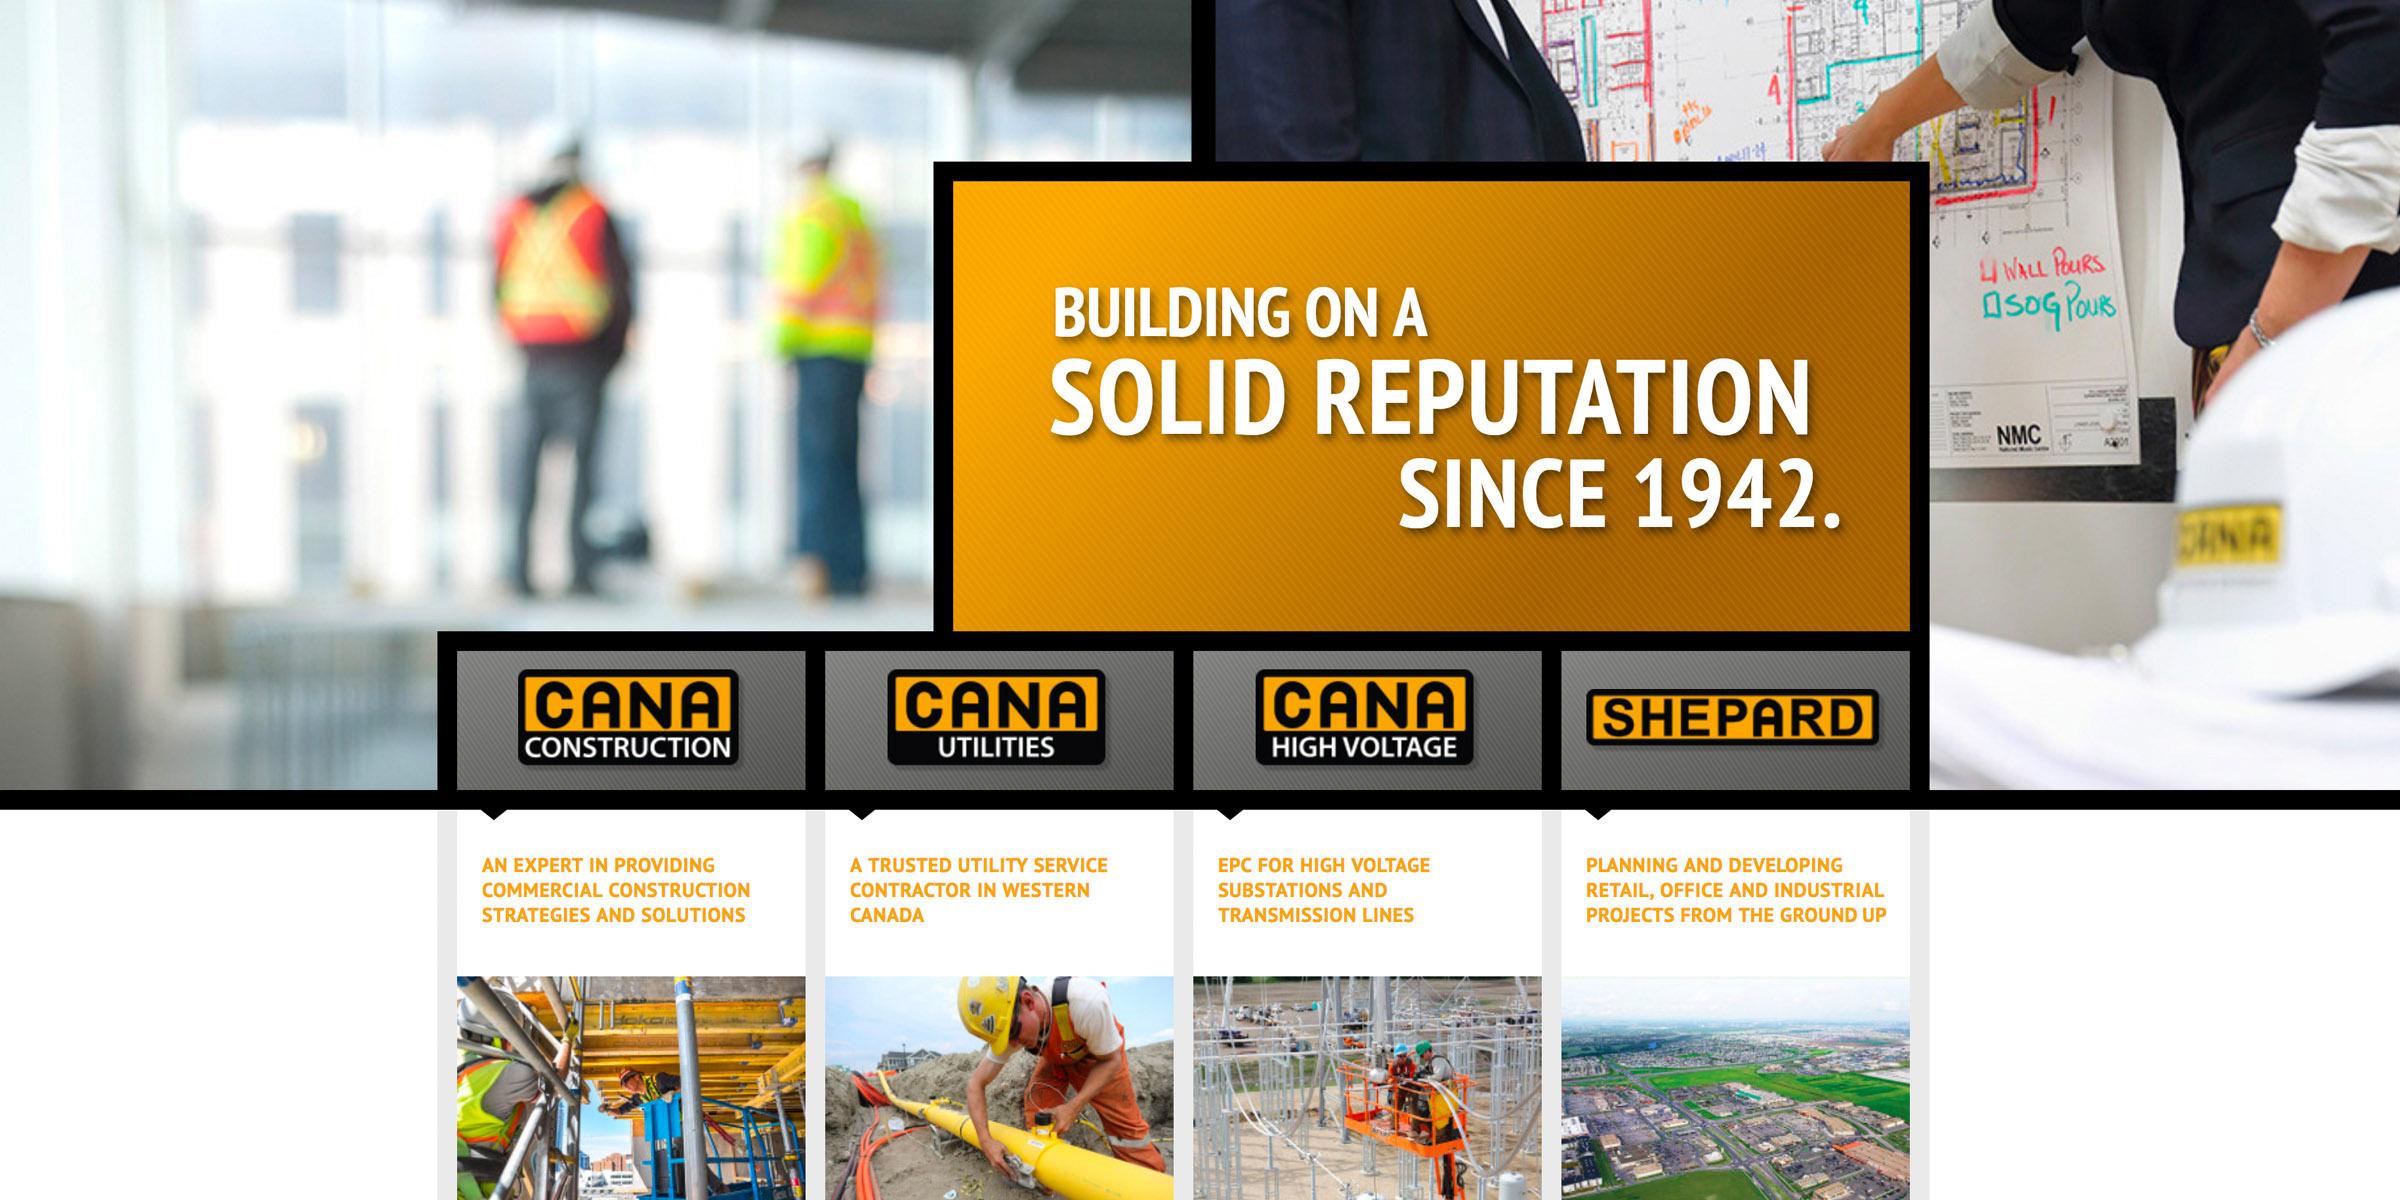 Cana homepage design